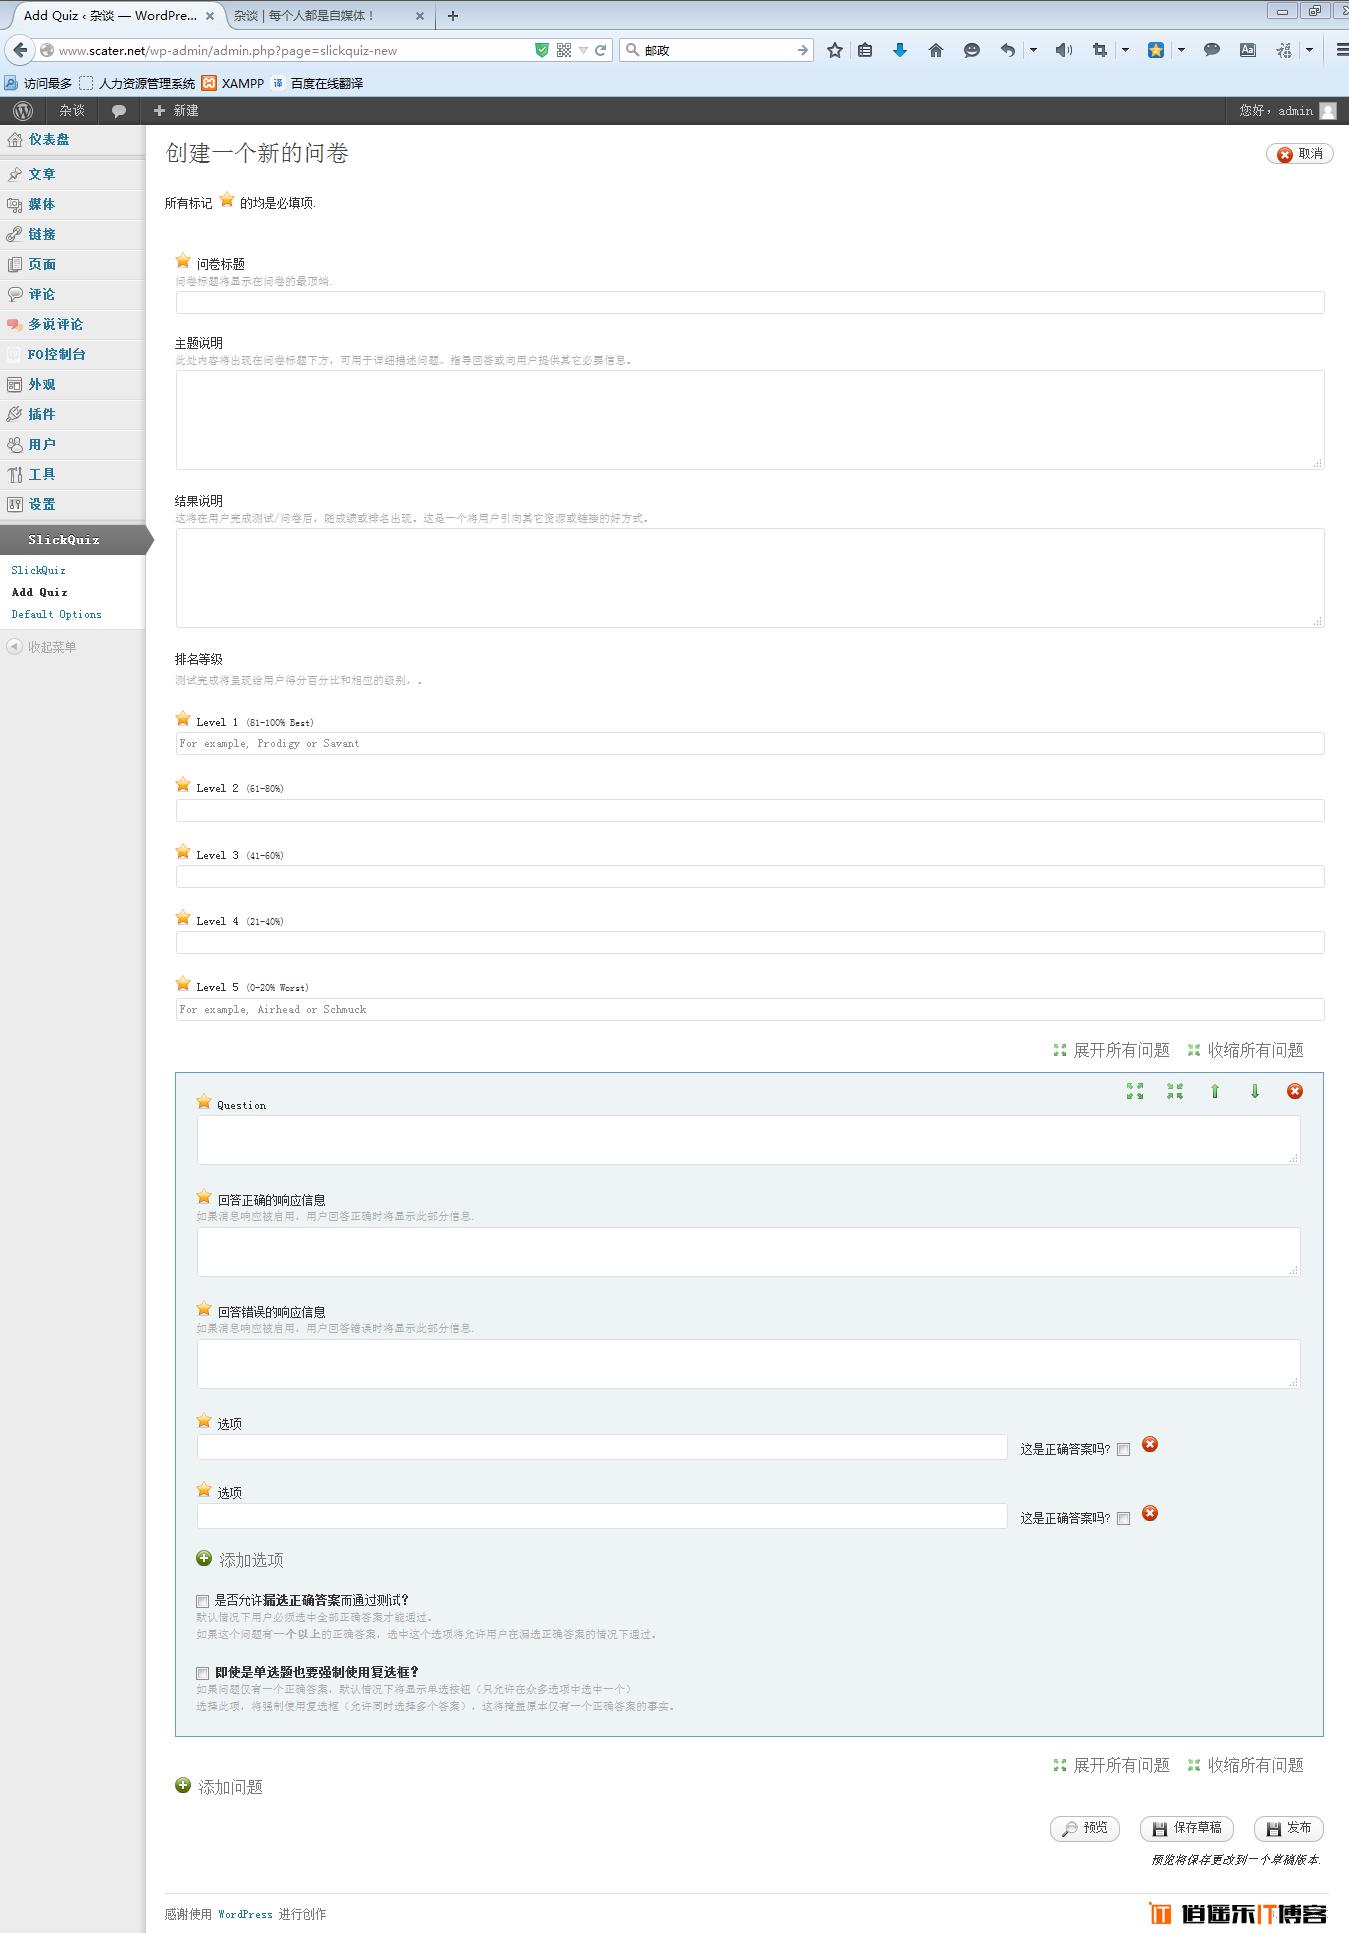 WordPress 问卷调查/考试插件:SlickQuiz 1.3.7.1 最新汉化版免费下载